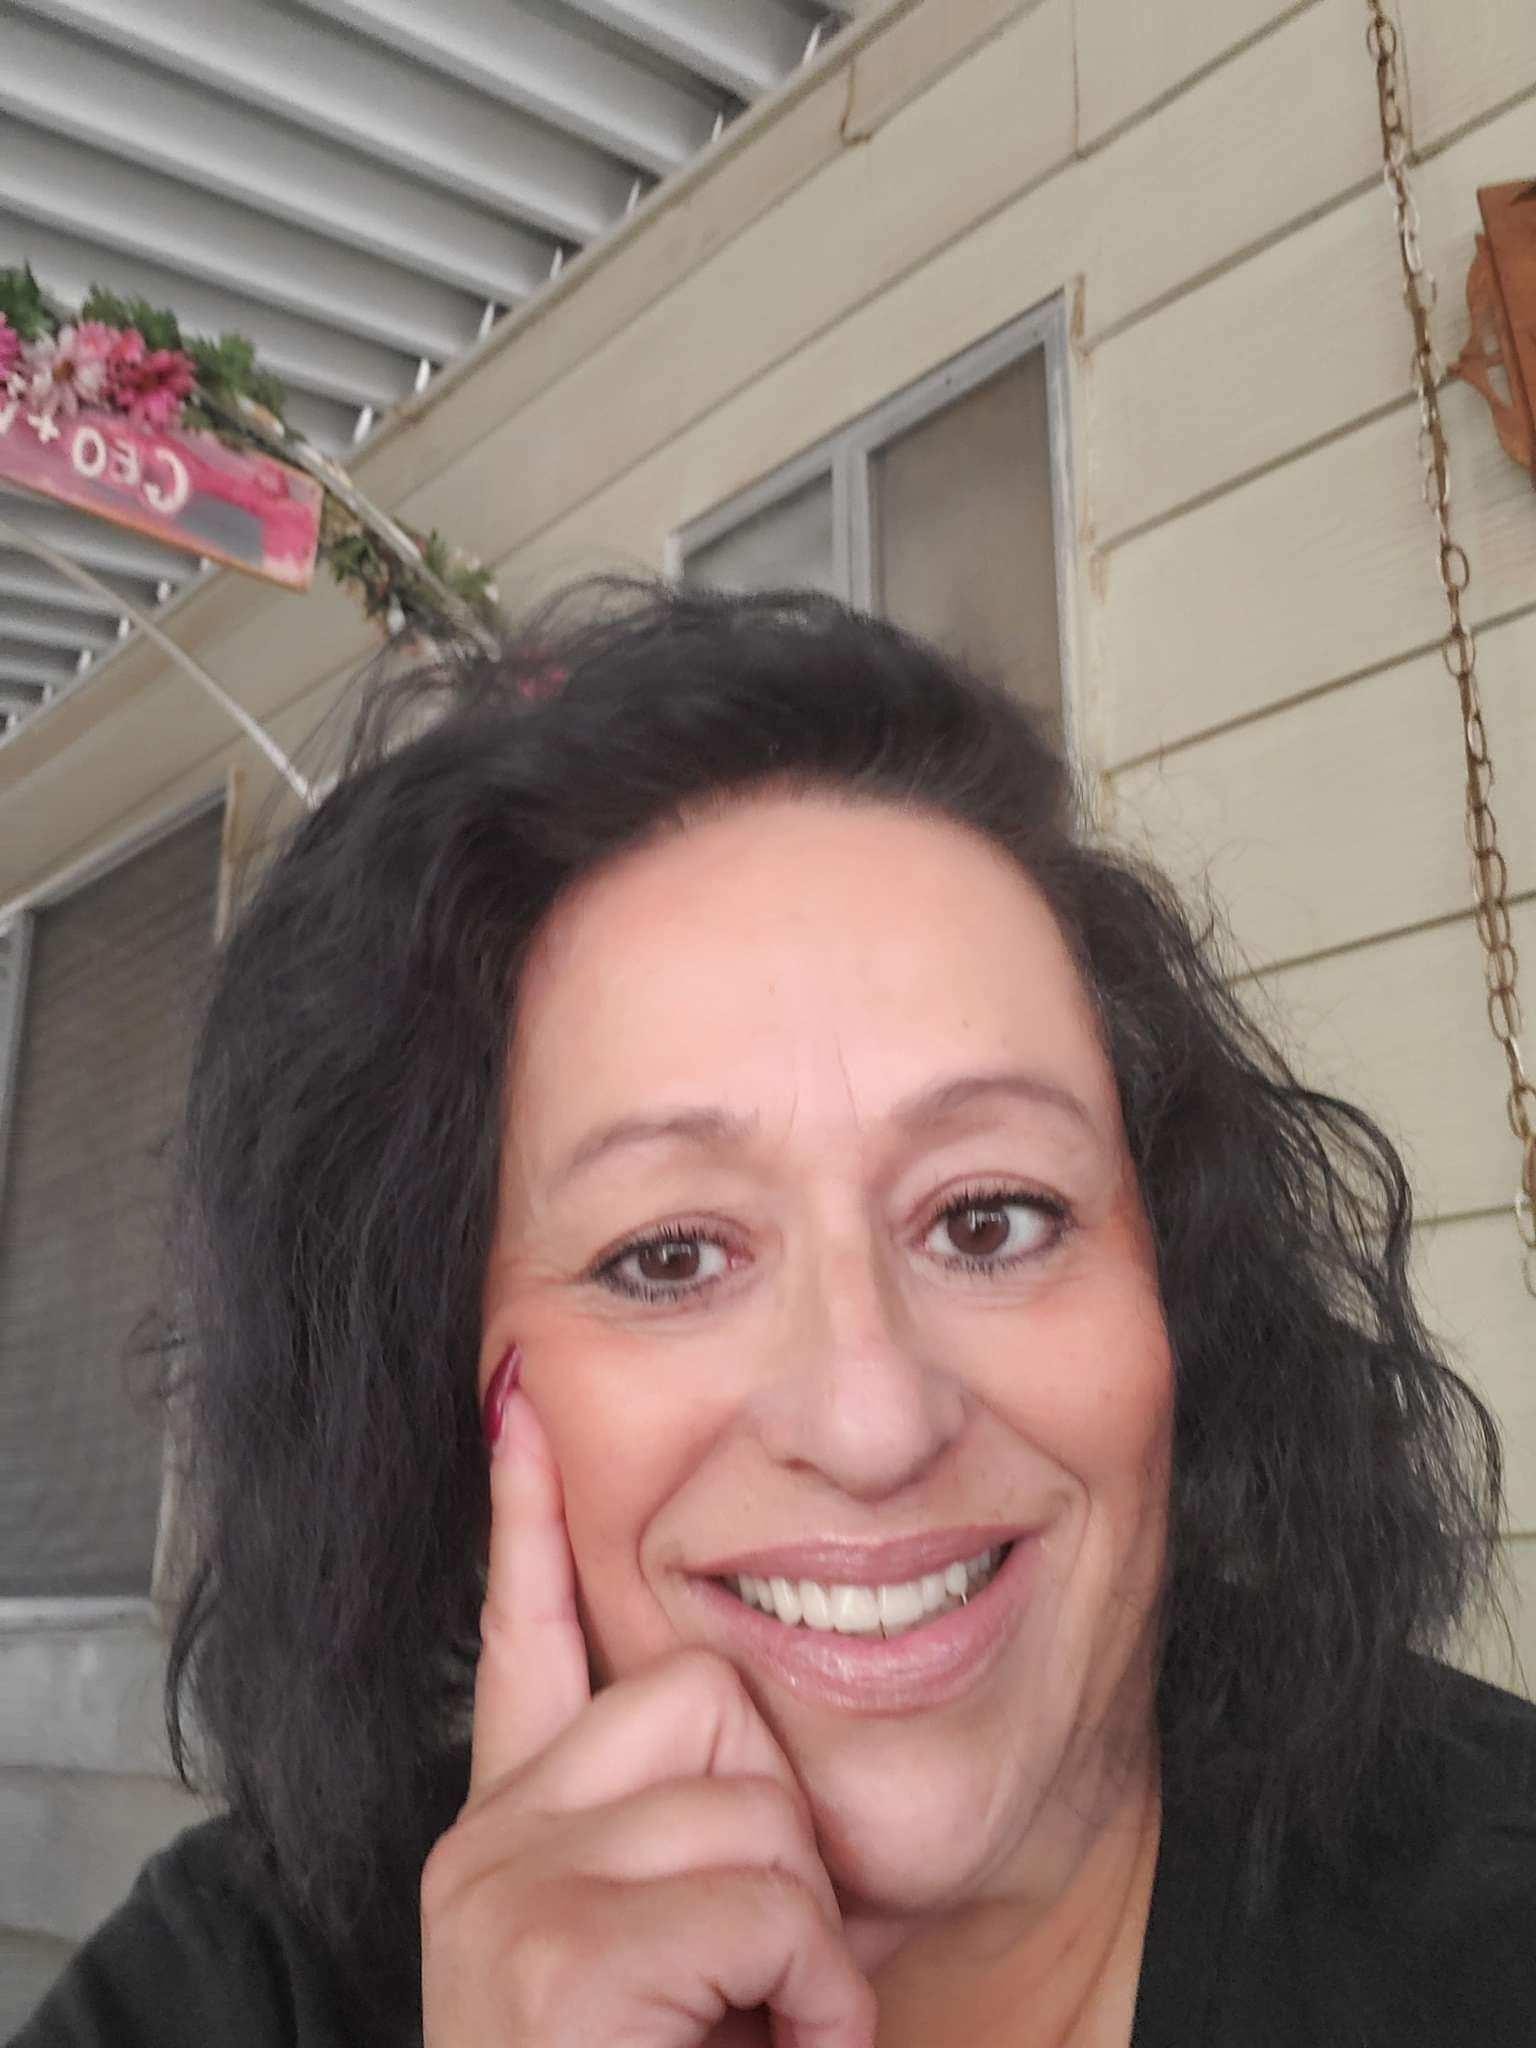 Vickie Hoy